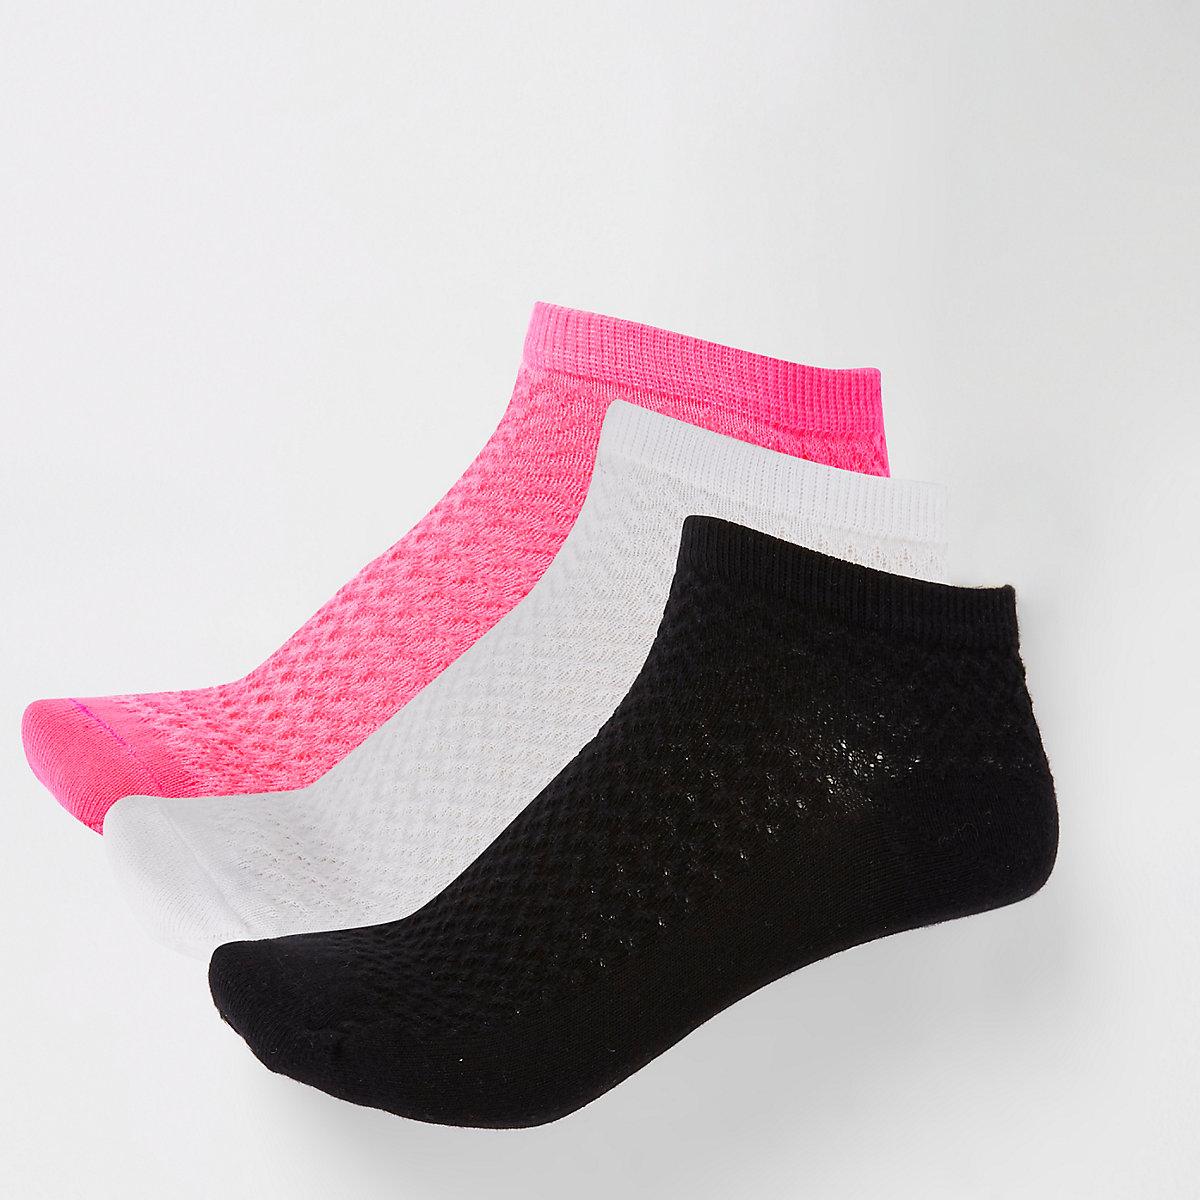 Bright pink trainer socks 3 pack